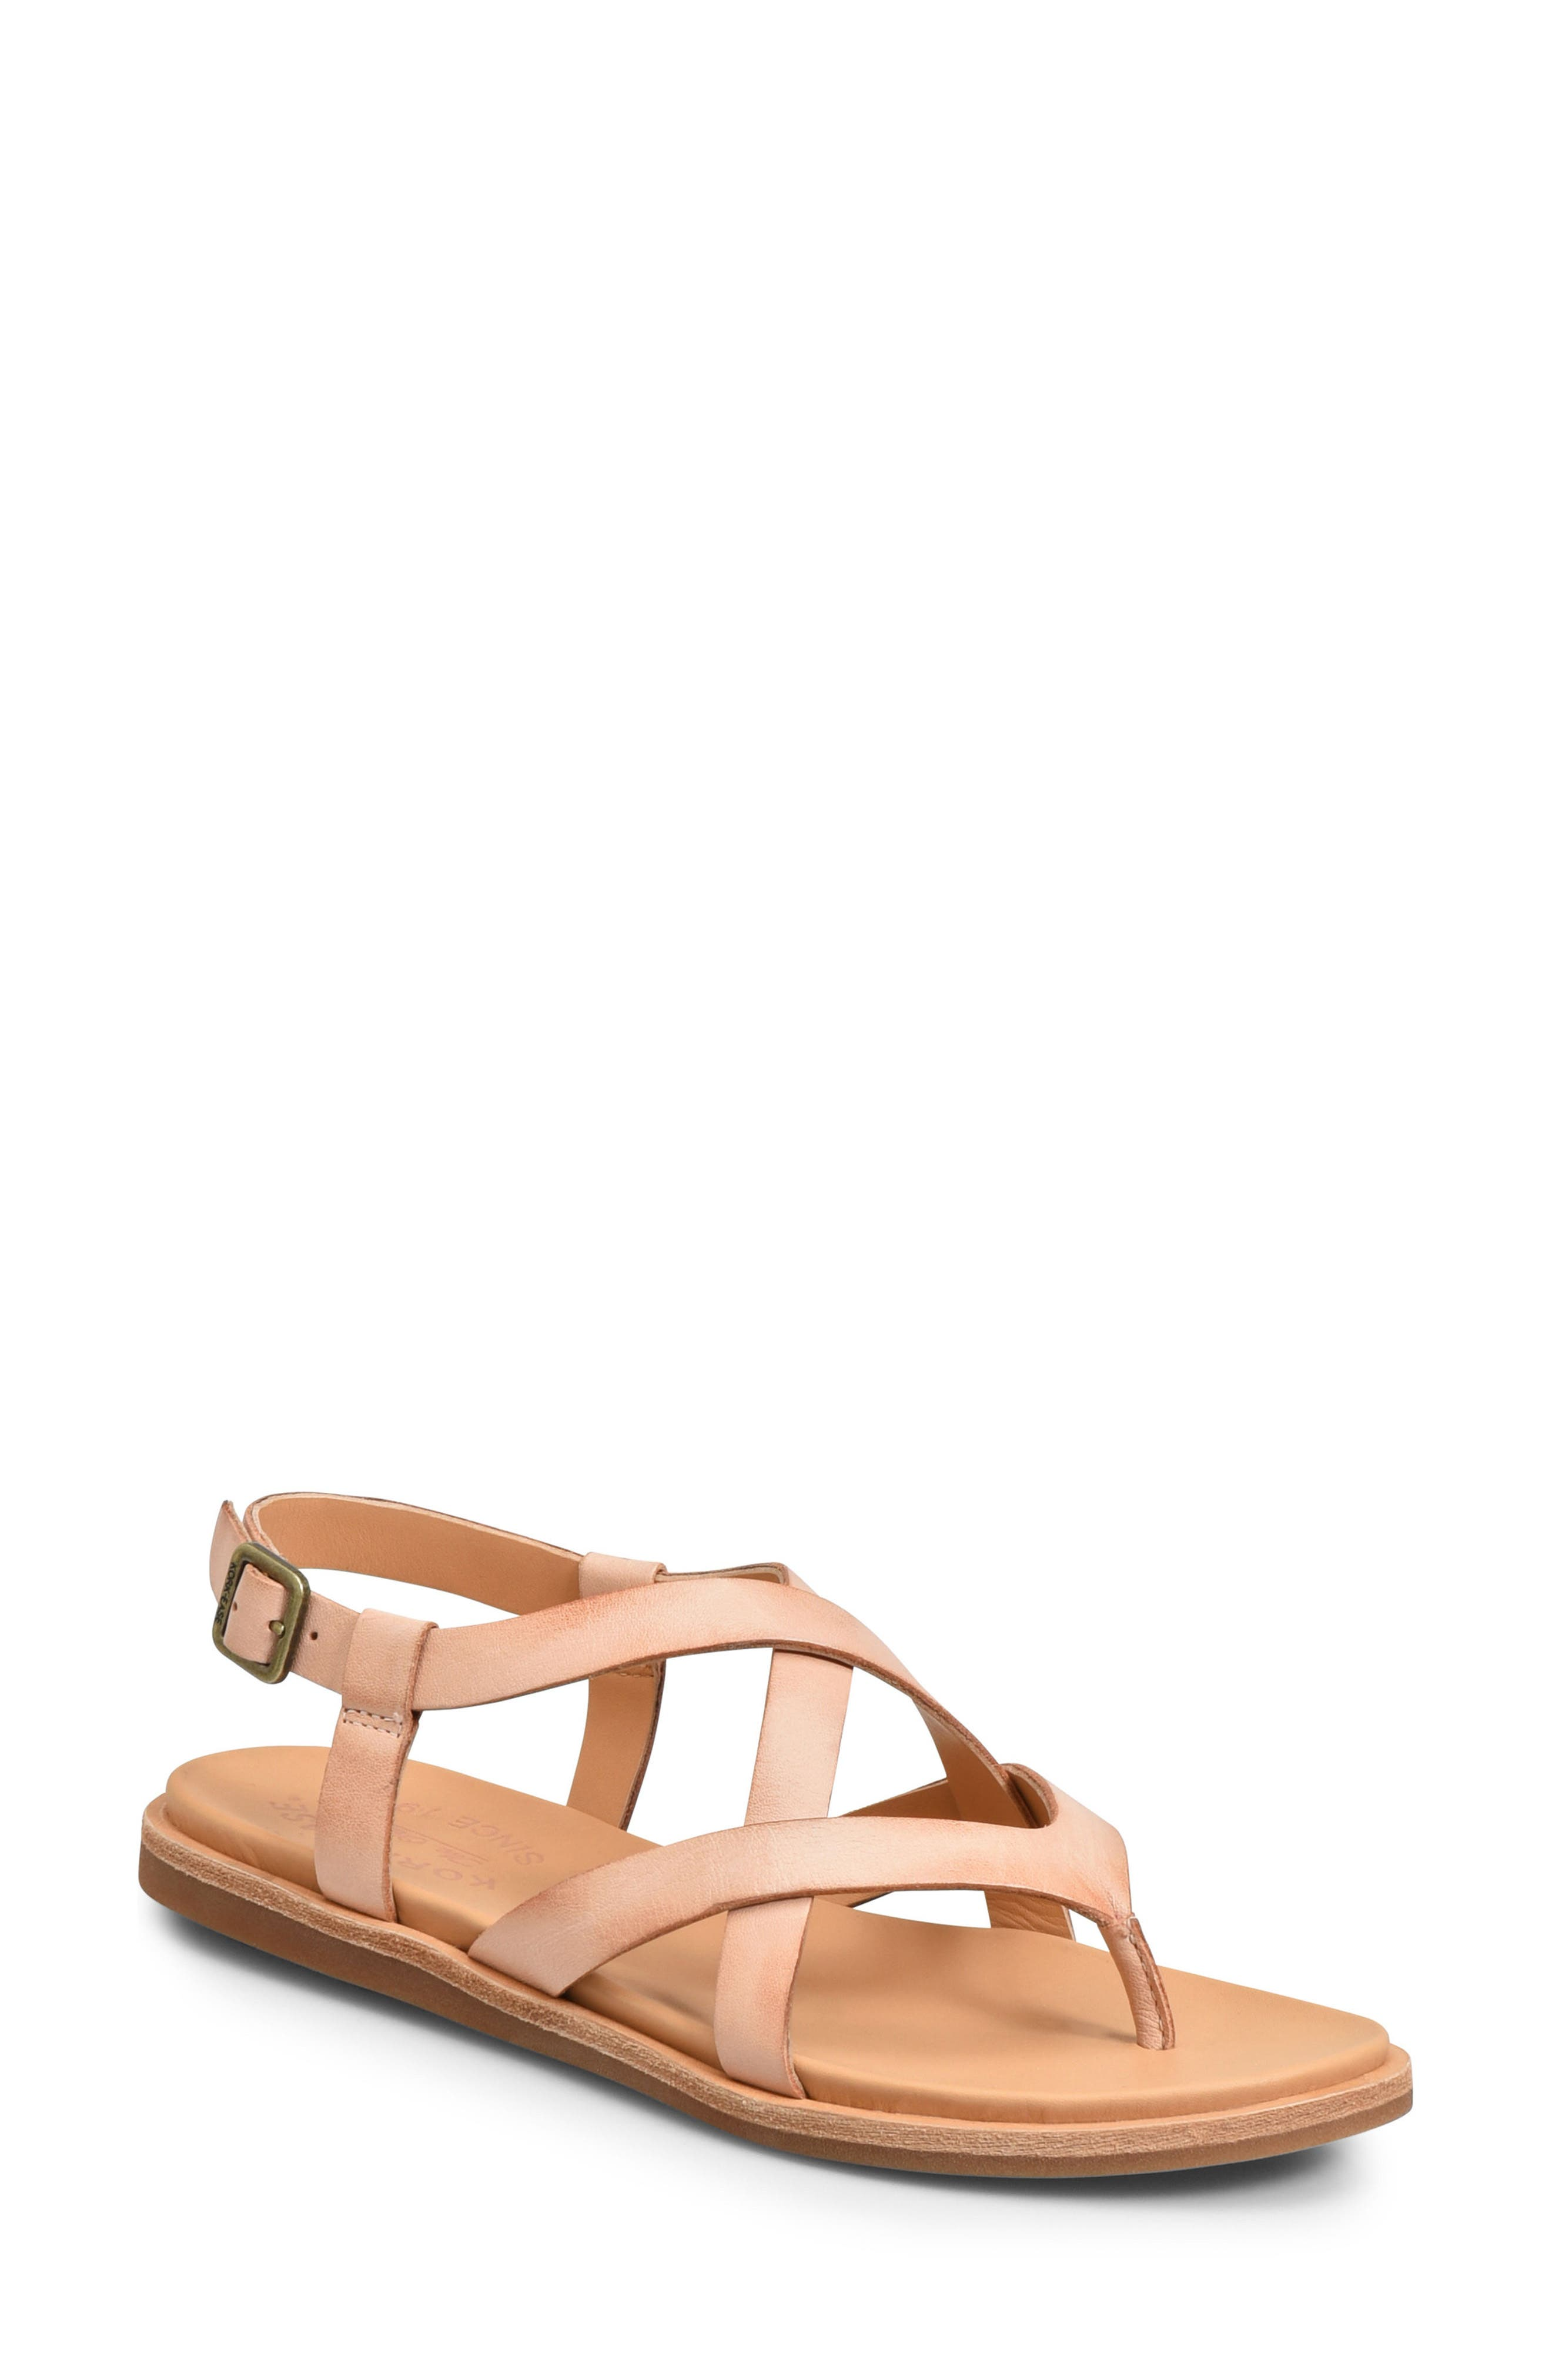 Yarbrough Sandal,                         Main,                         color, Blush Leather